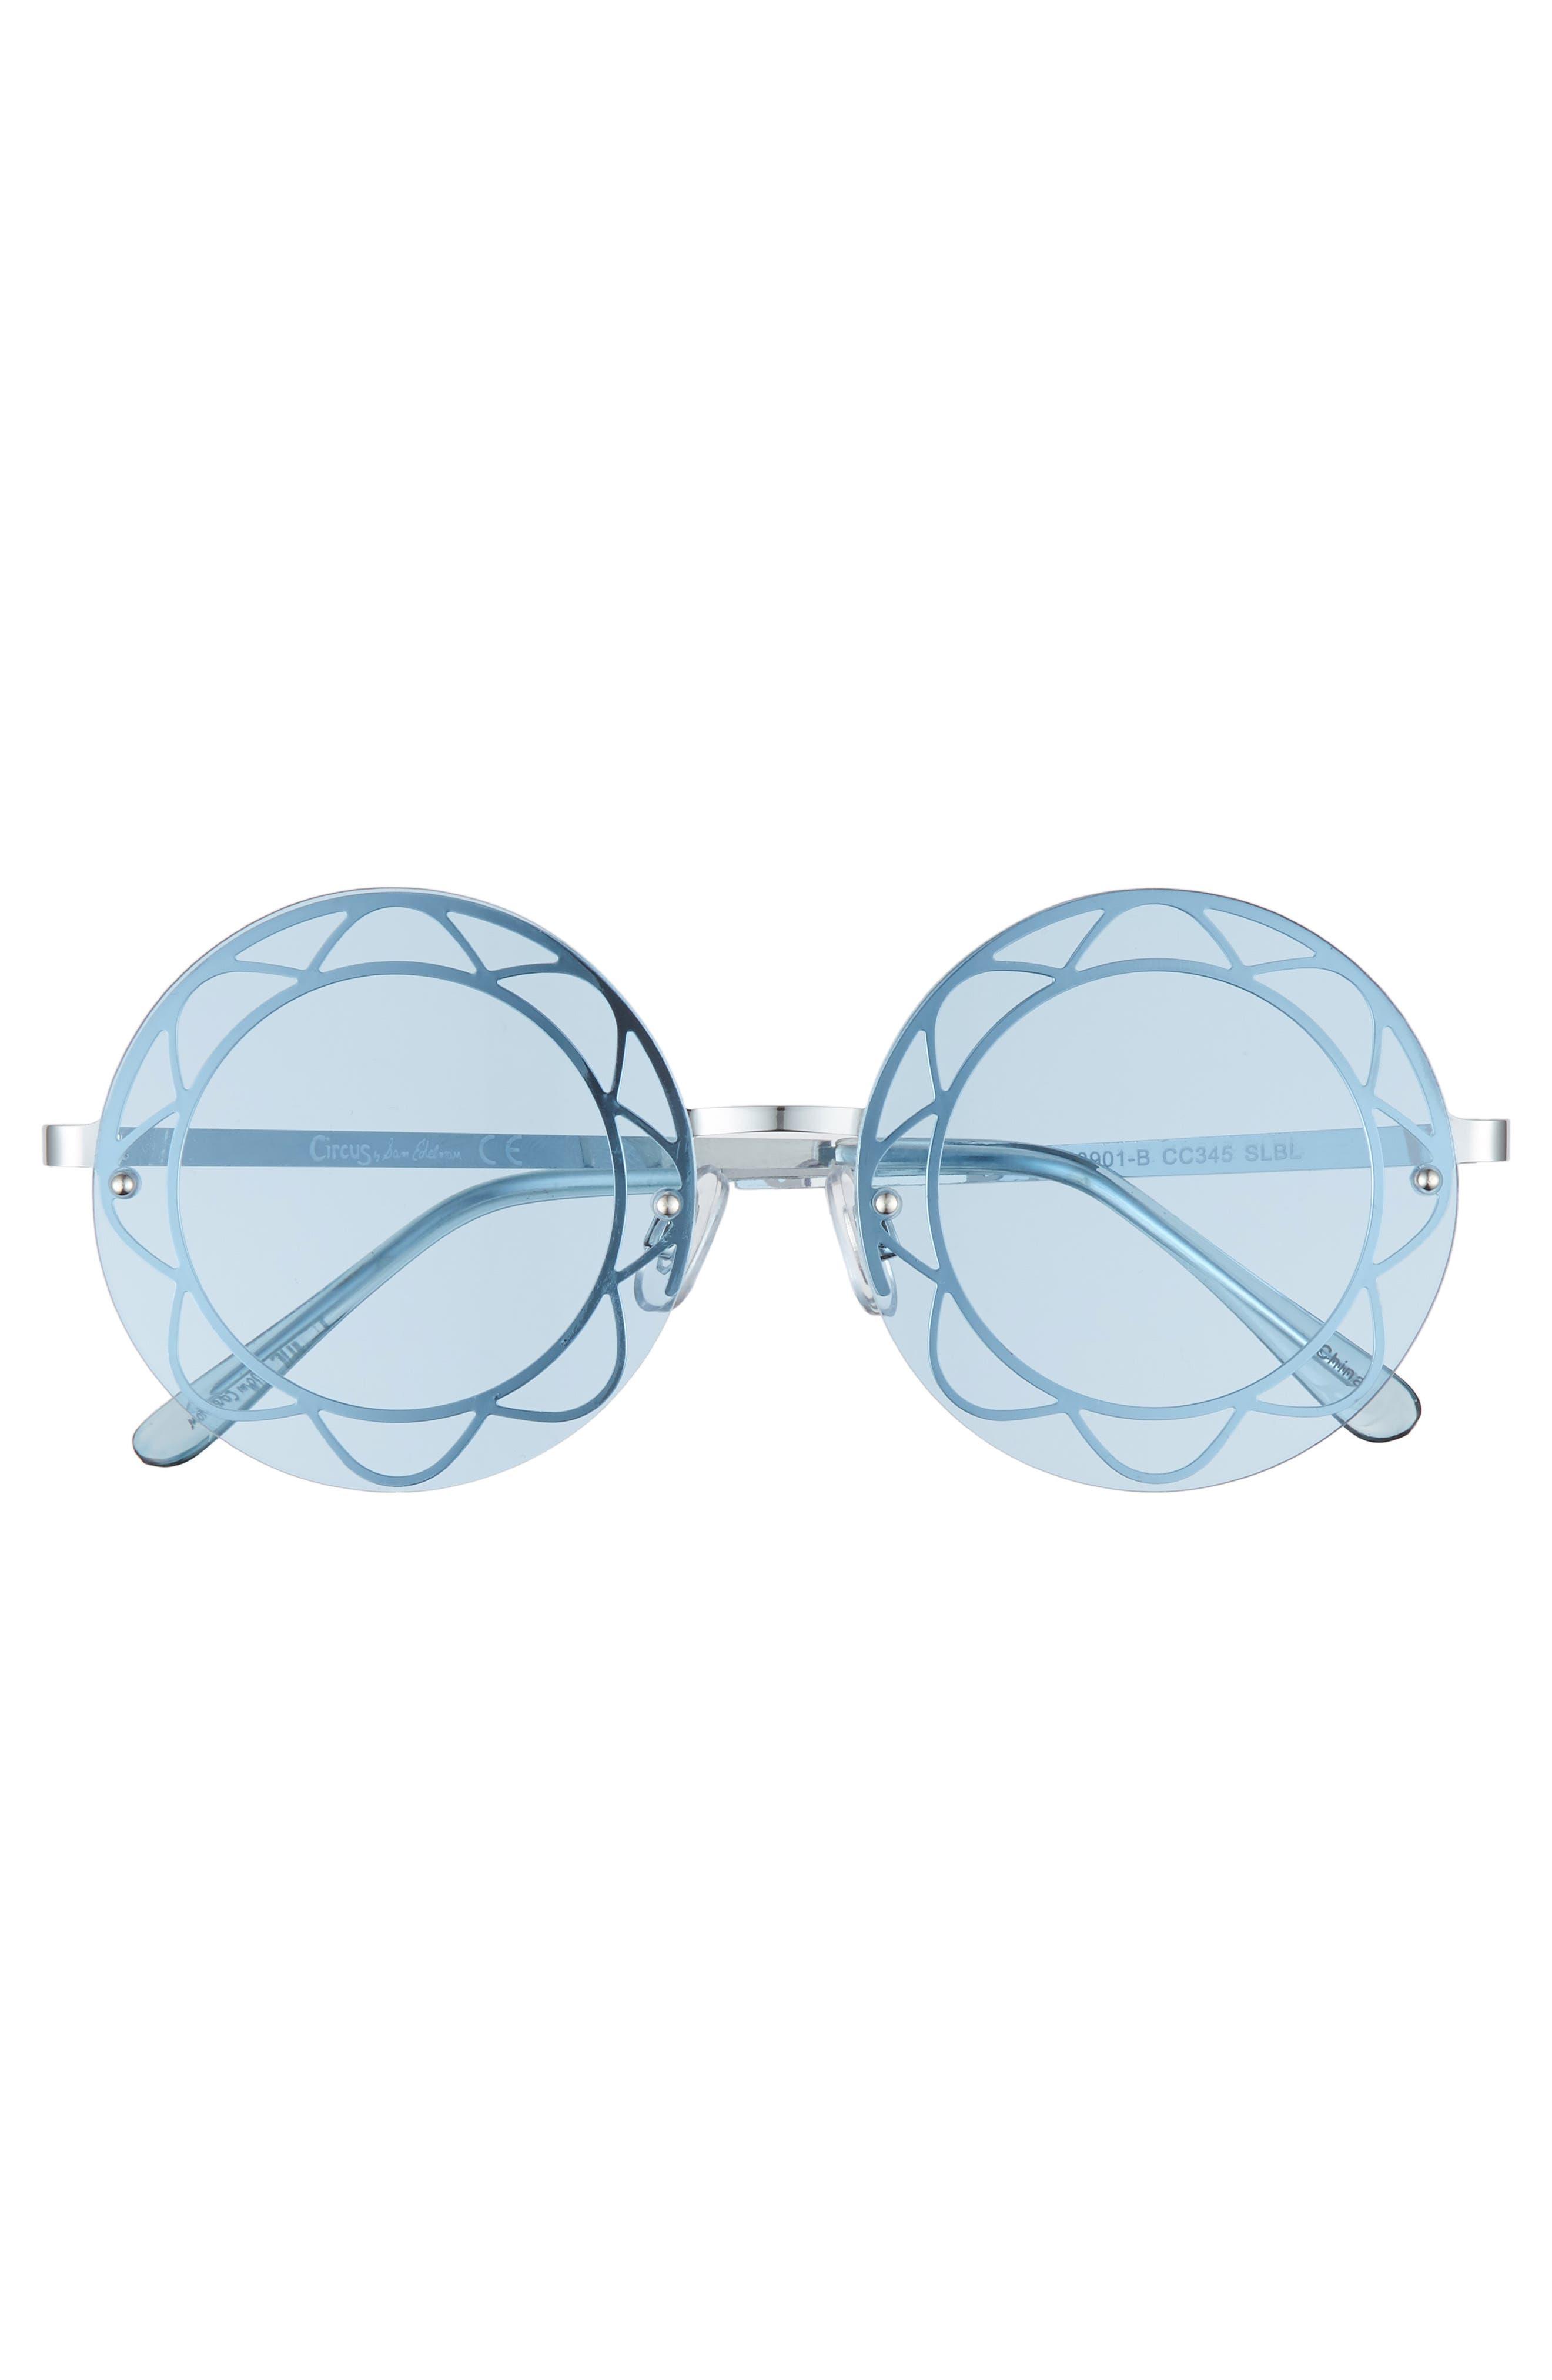 55mm Round Sunglasses,                             Alternate thumbnail 3, color,                             047